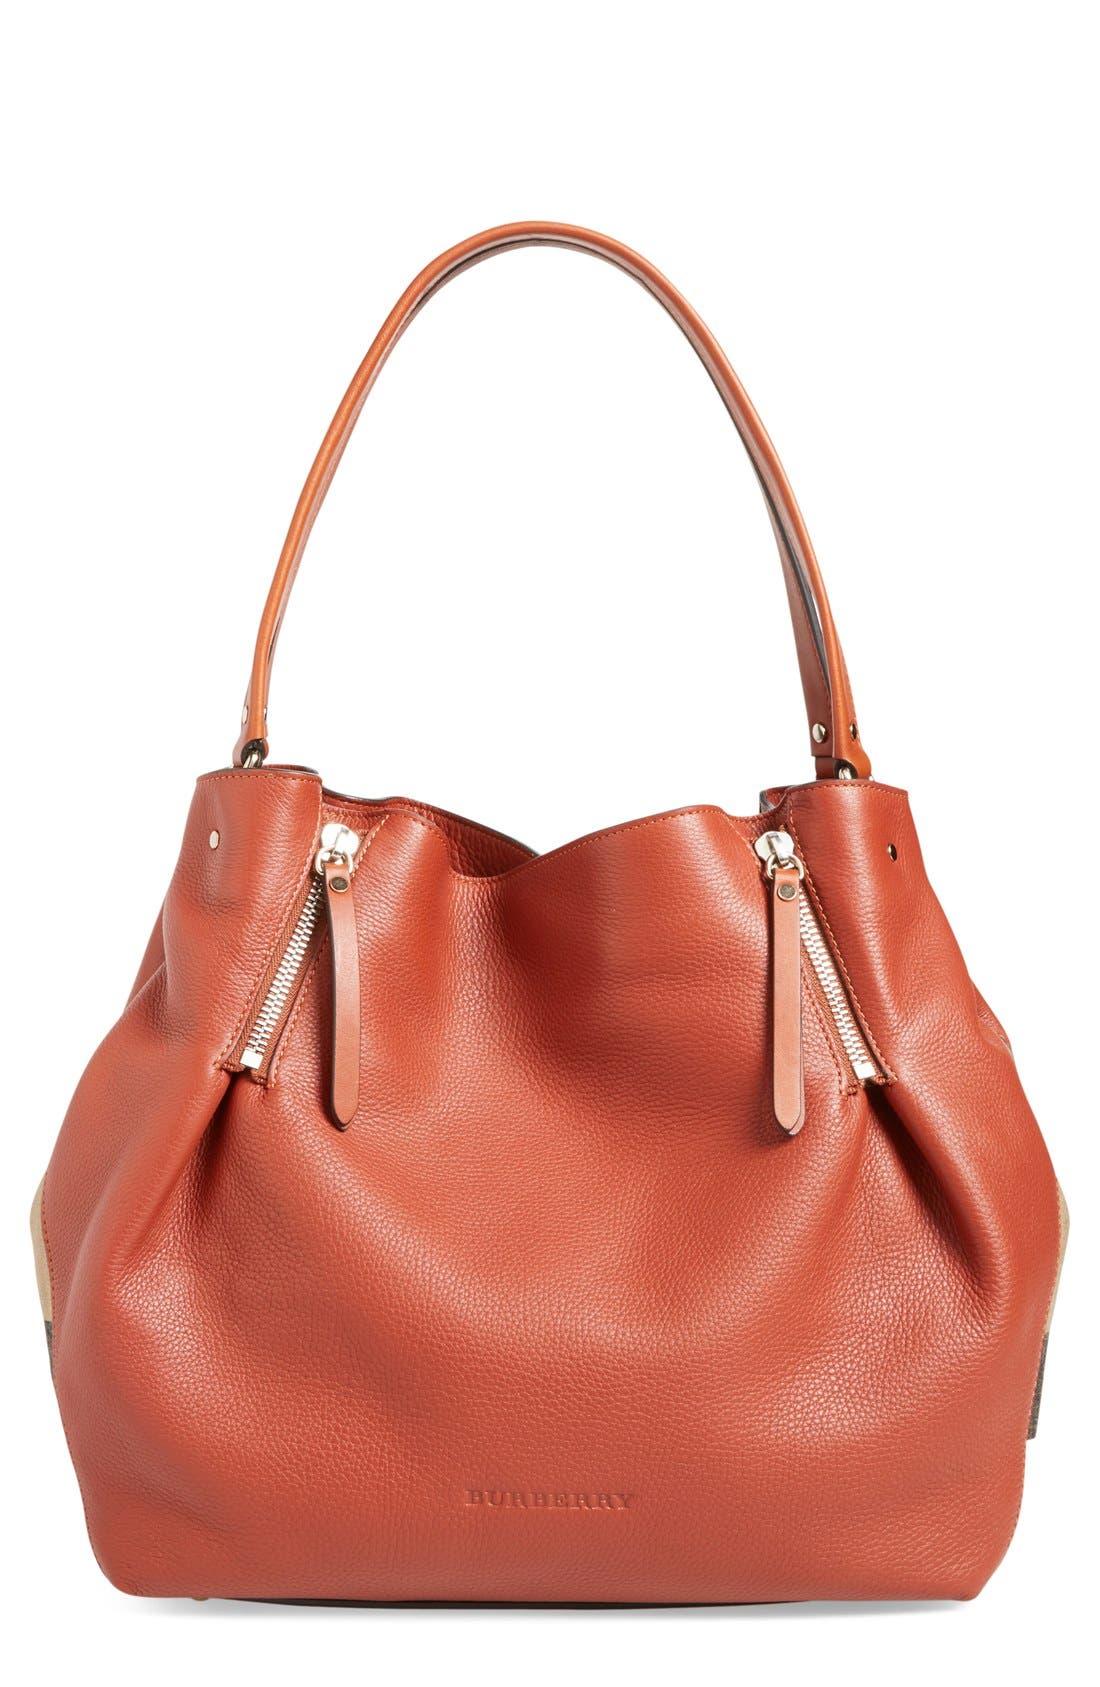 BURBERRY 'Medium Maidstone' Leather Tote, Main, color, 200